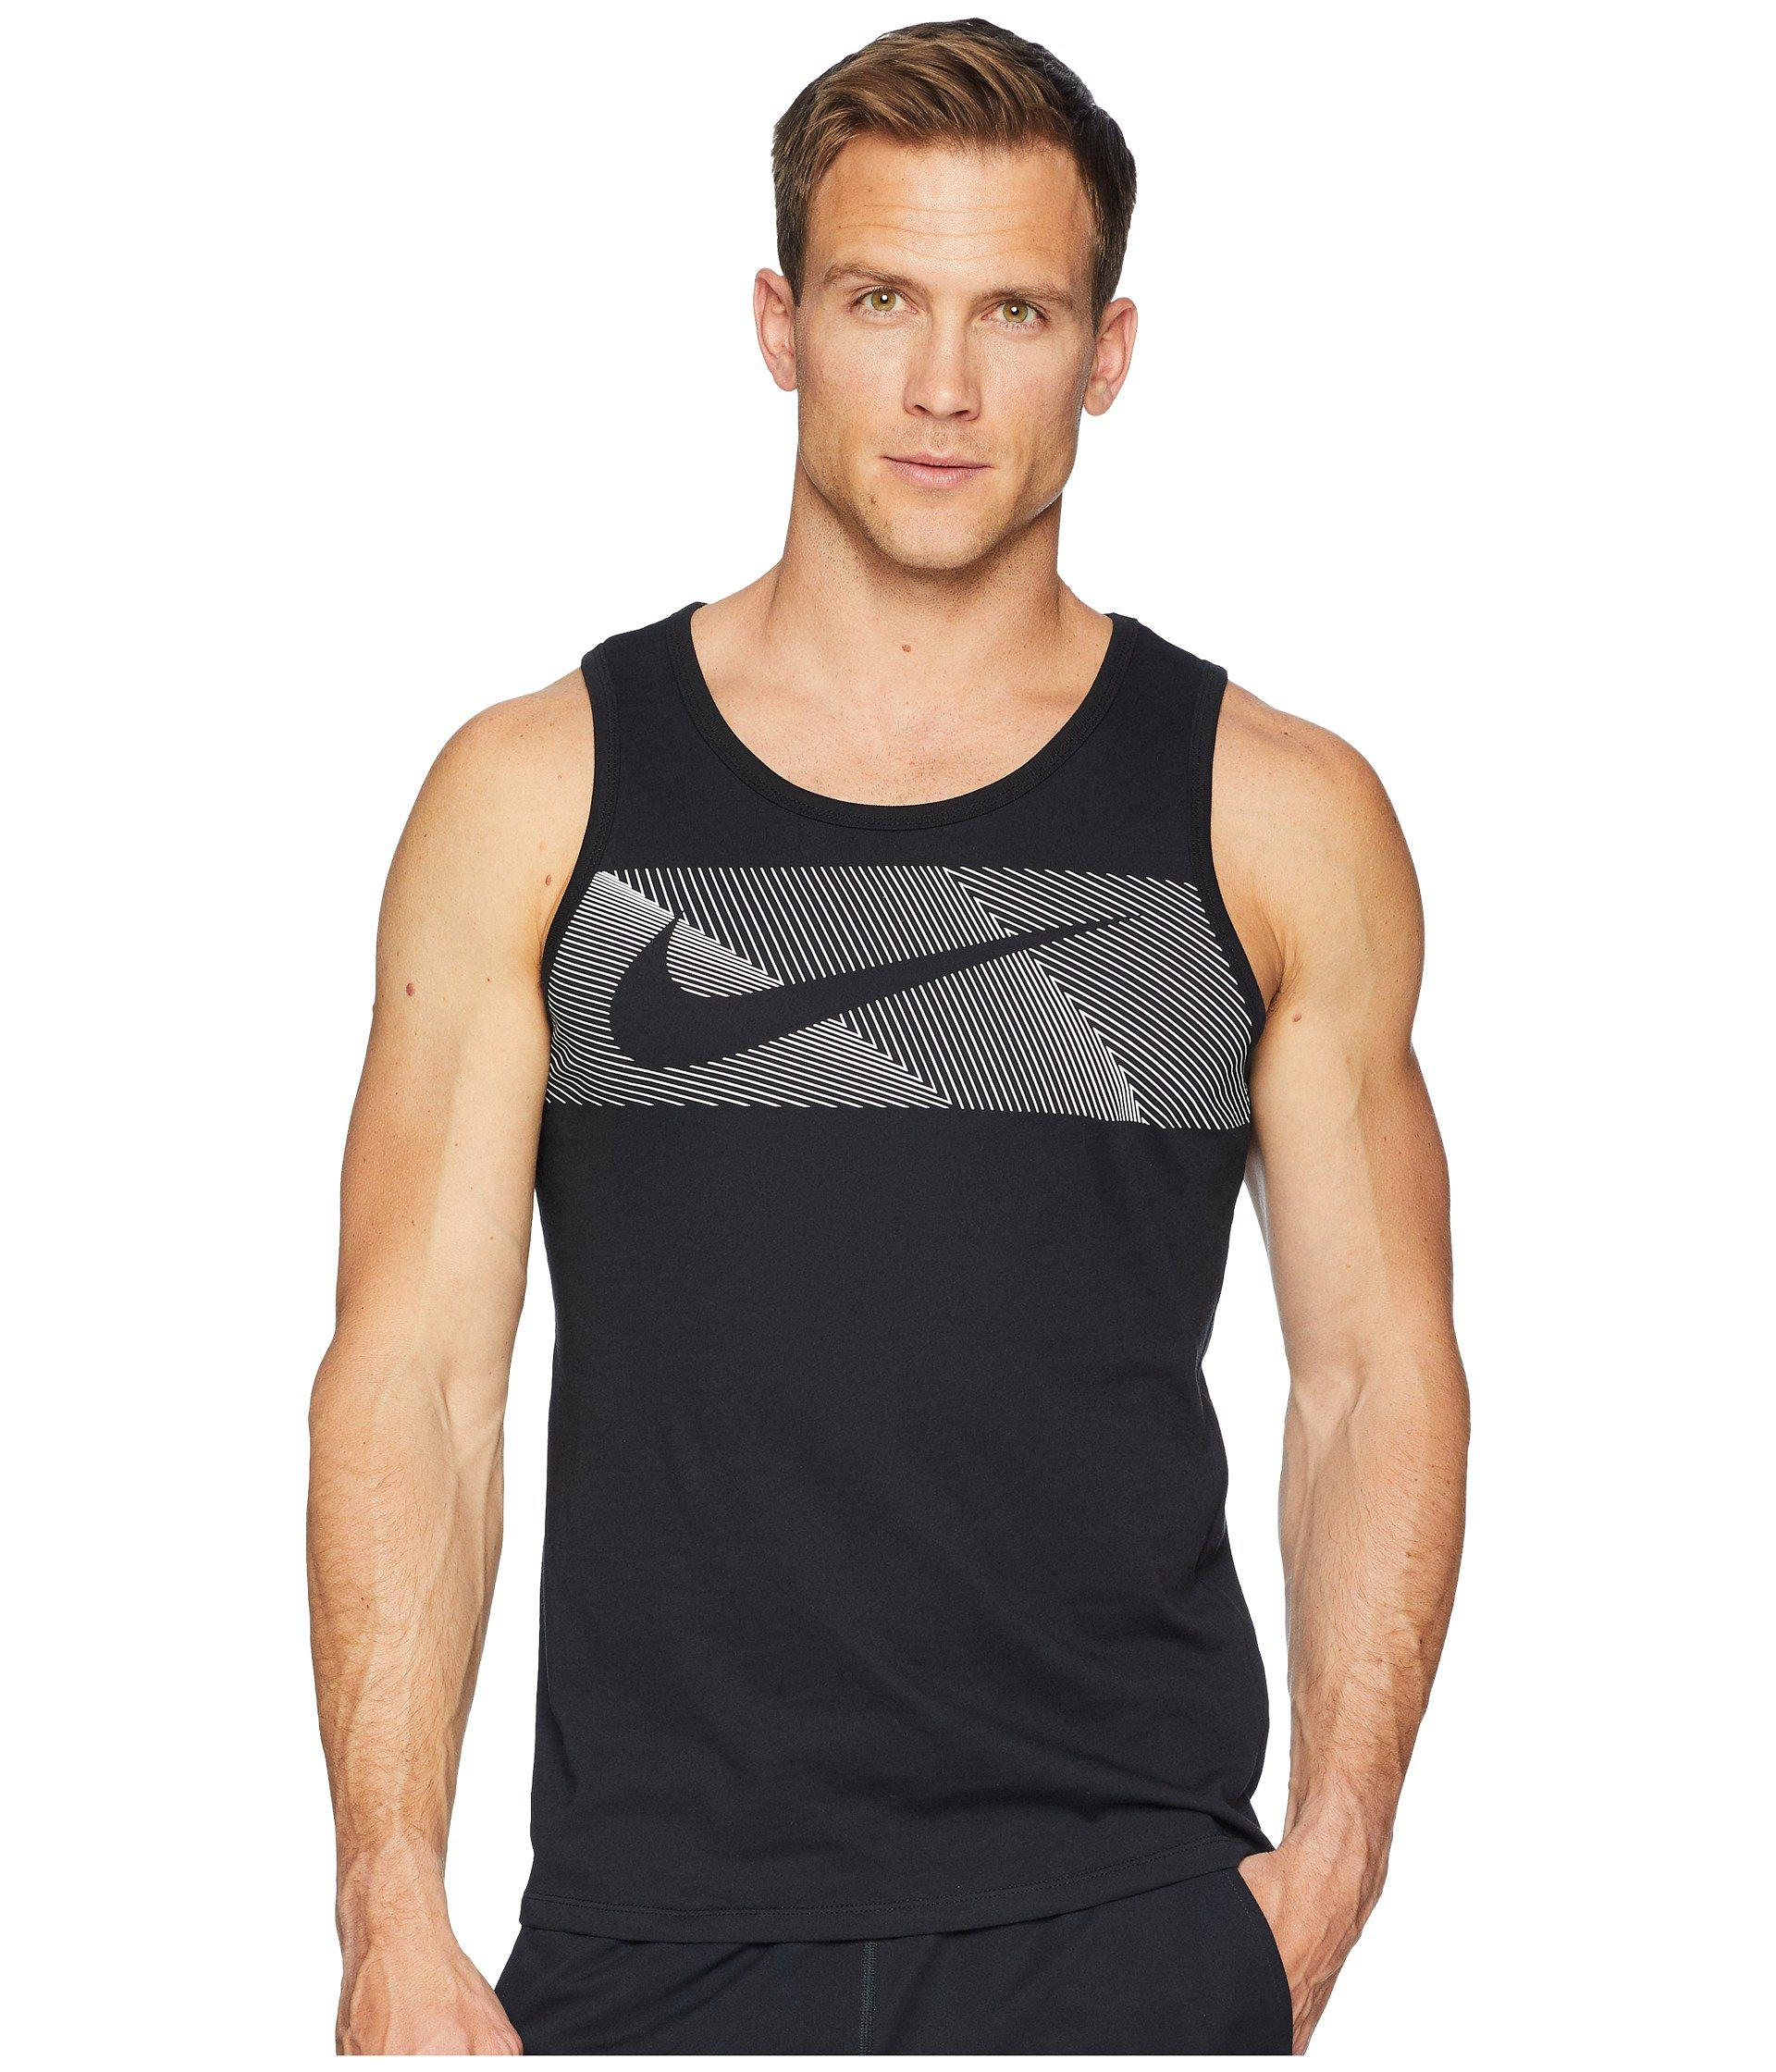 a365a1f64f4f74 Nike Fit Dry Sleeveless Shirt - BCD Tofu House